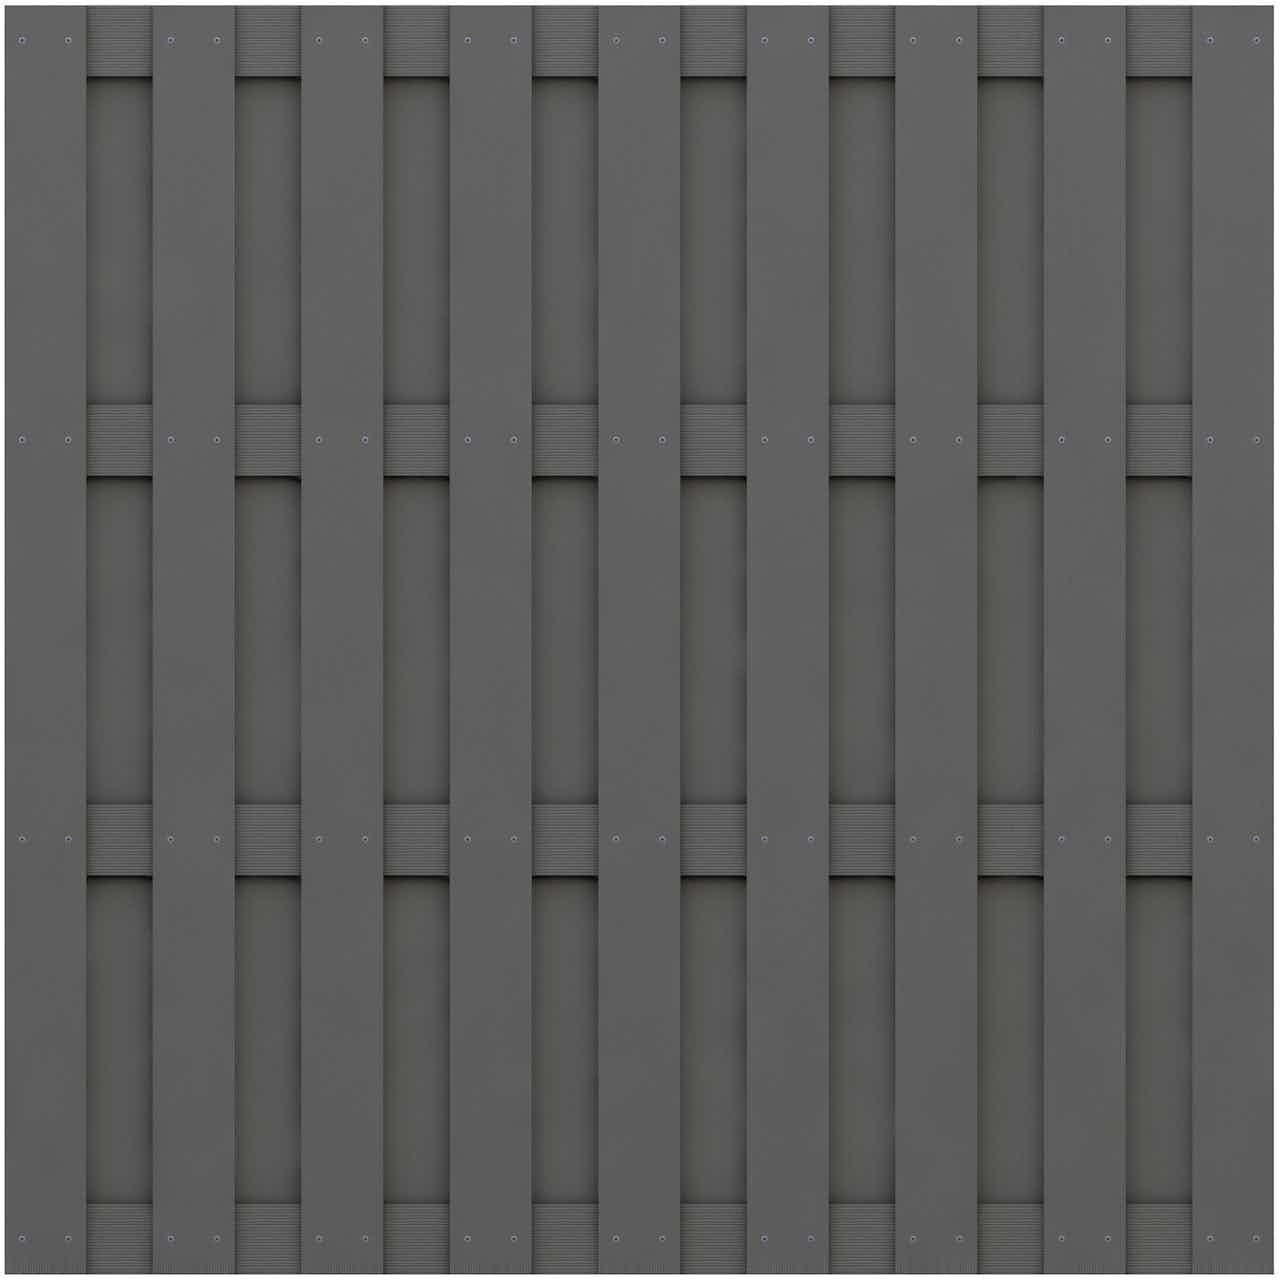 Sichtschutzzaun Element Jumbo WPC Anthrazit 179 cm x 179 cm